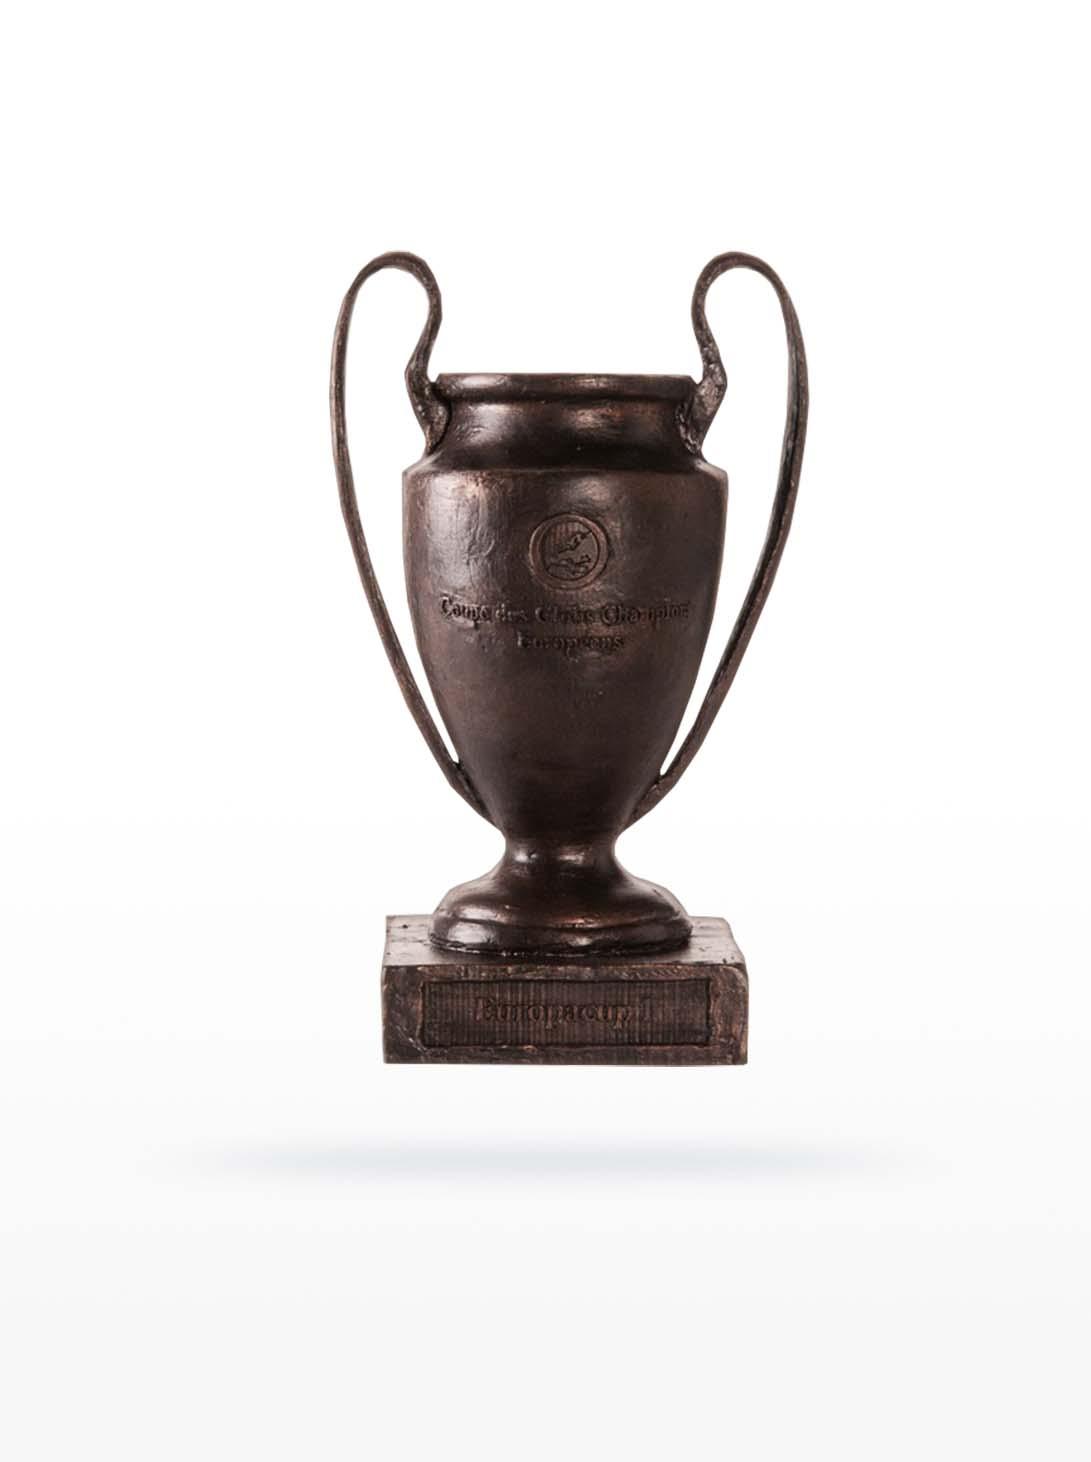 Icoon in Beeld - Europacup 1 - Brons